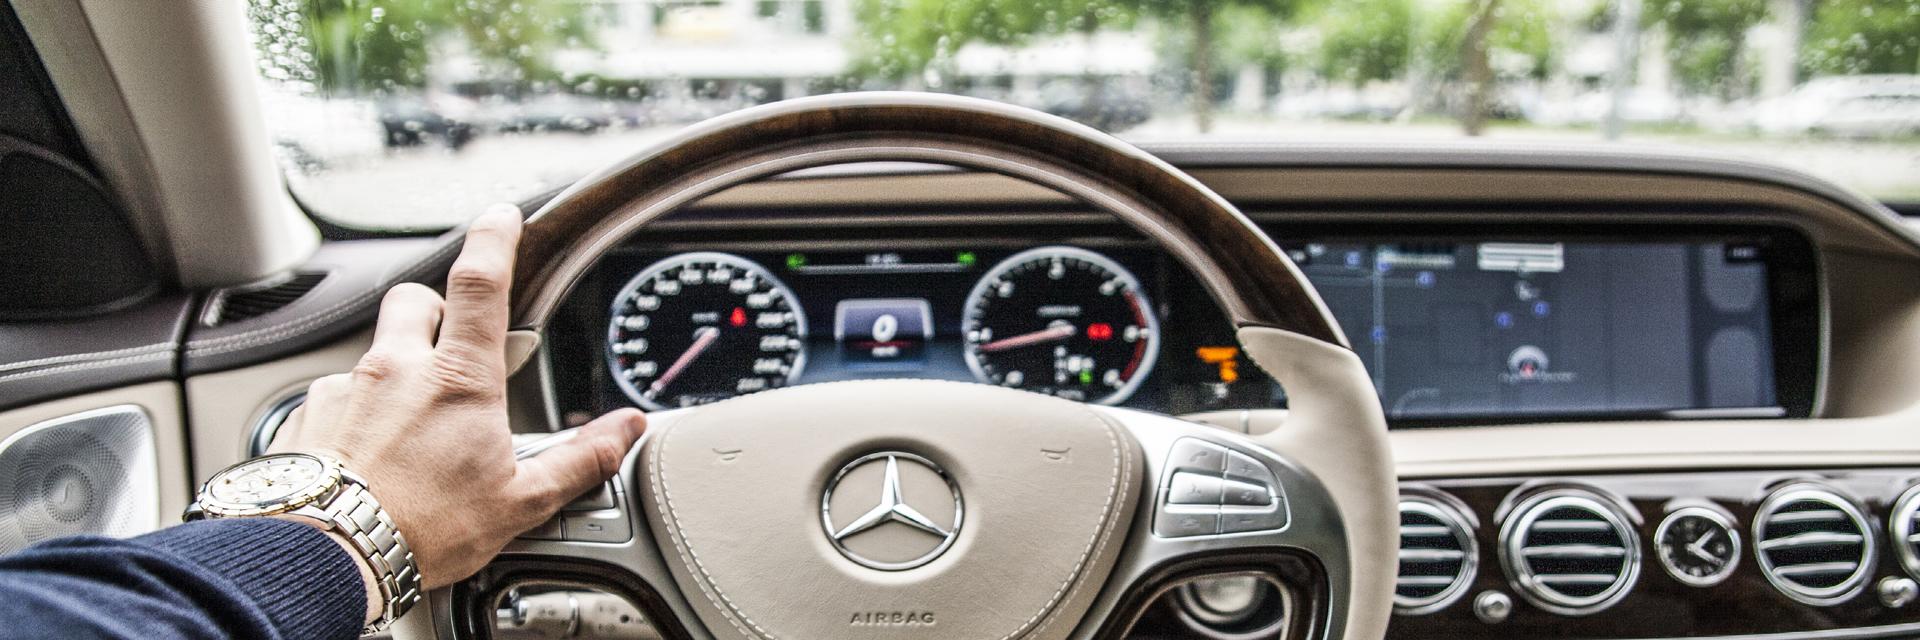 hand-car-wheel-automobile-interior-driving-718703-pxhere-com